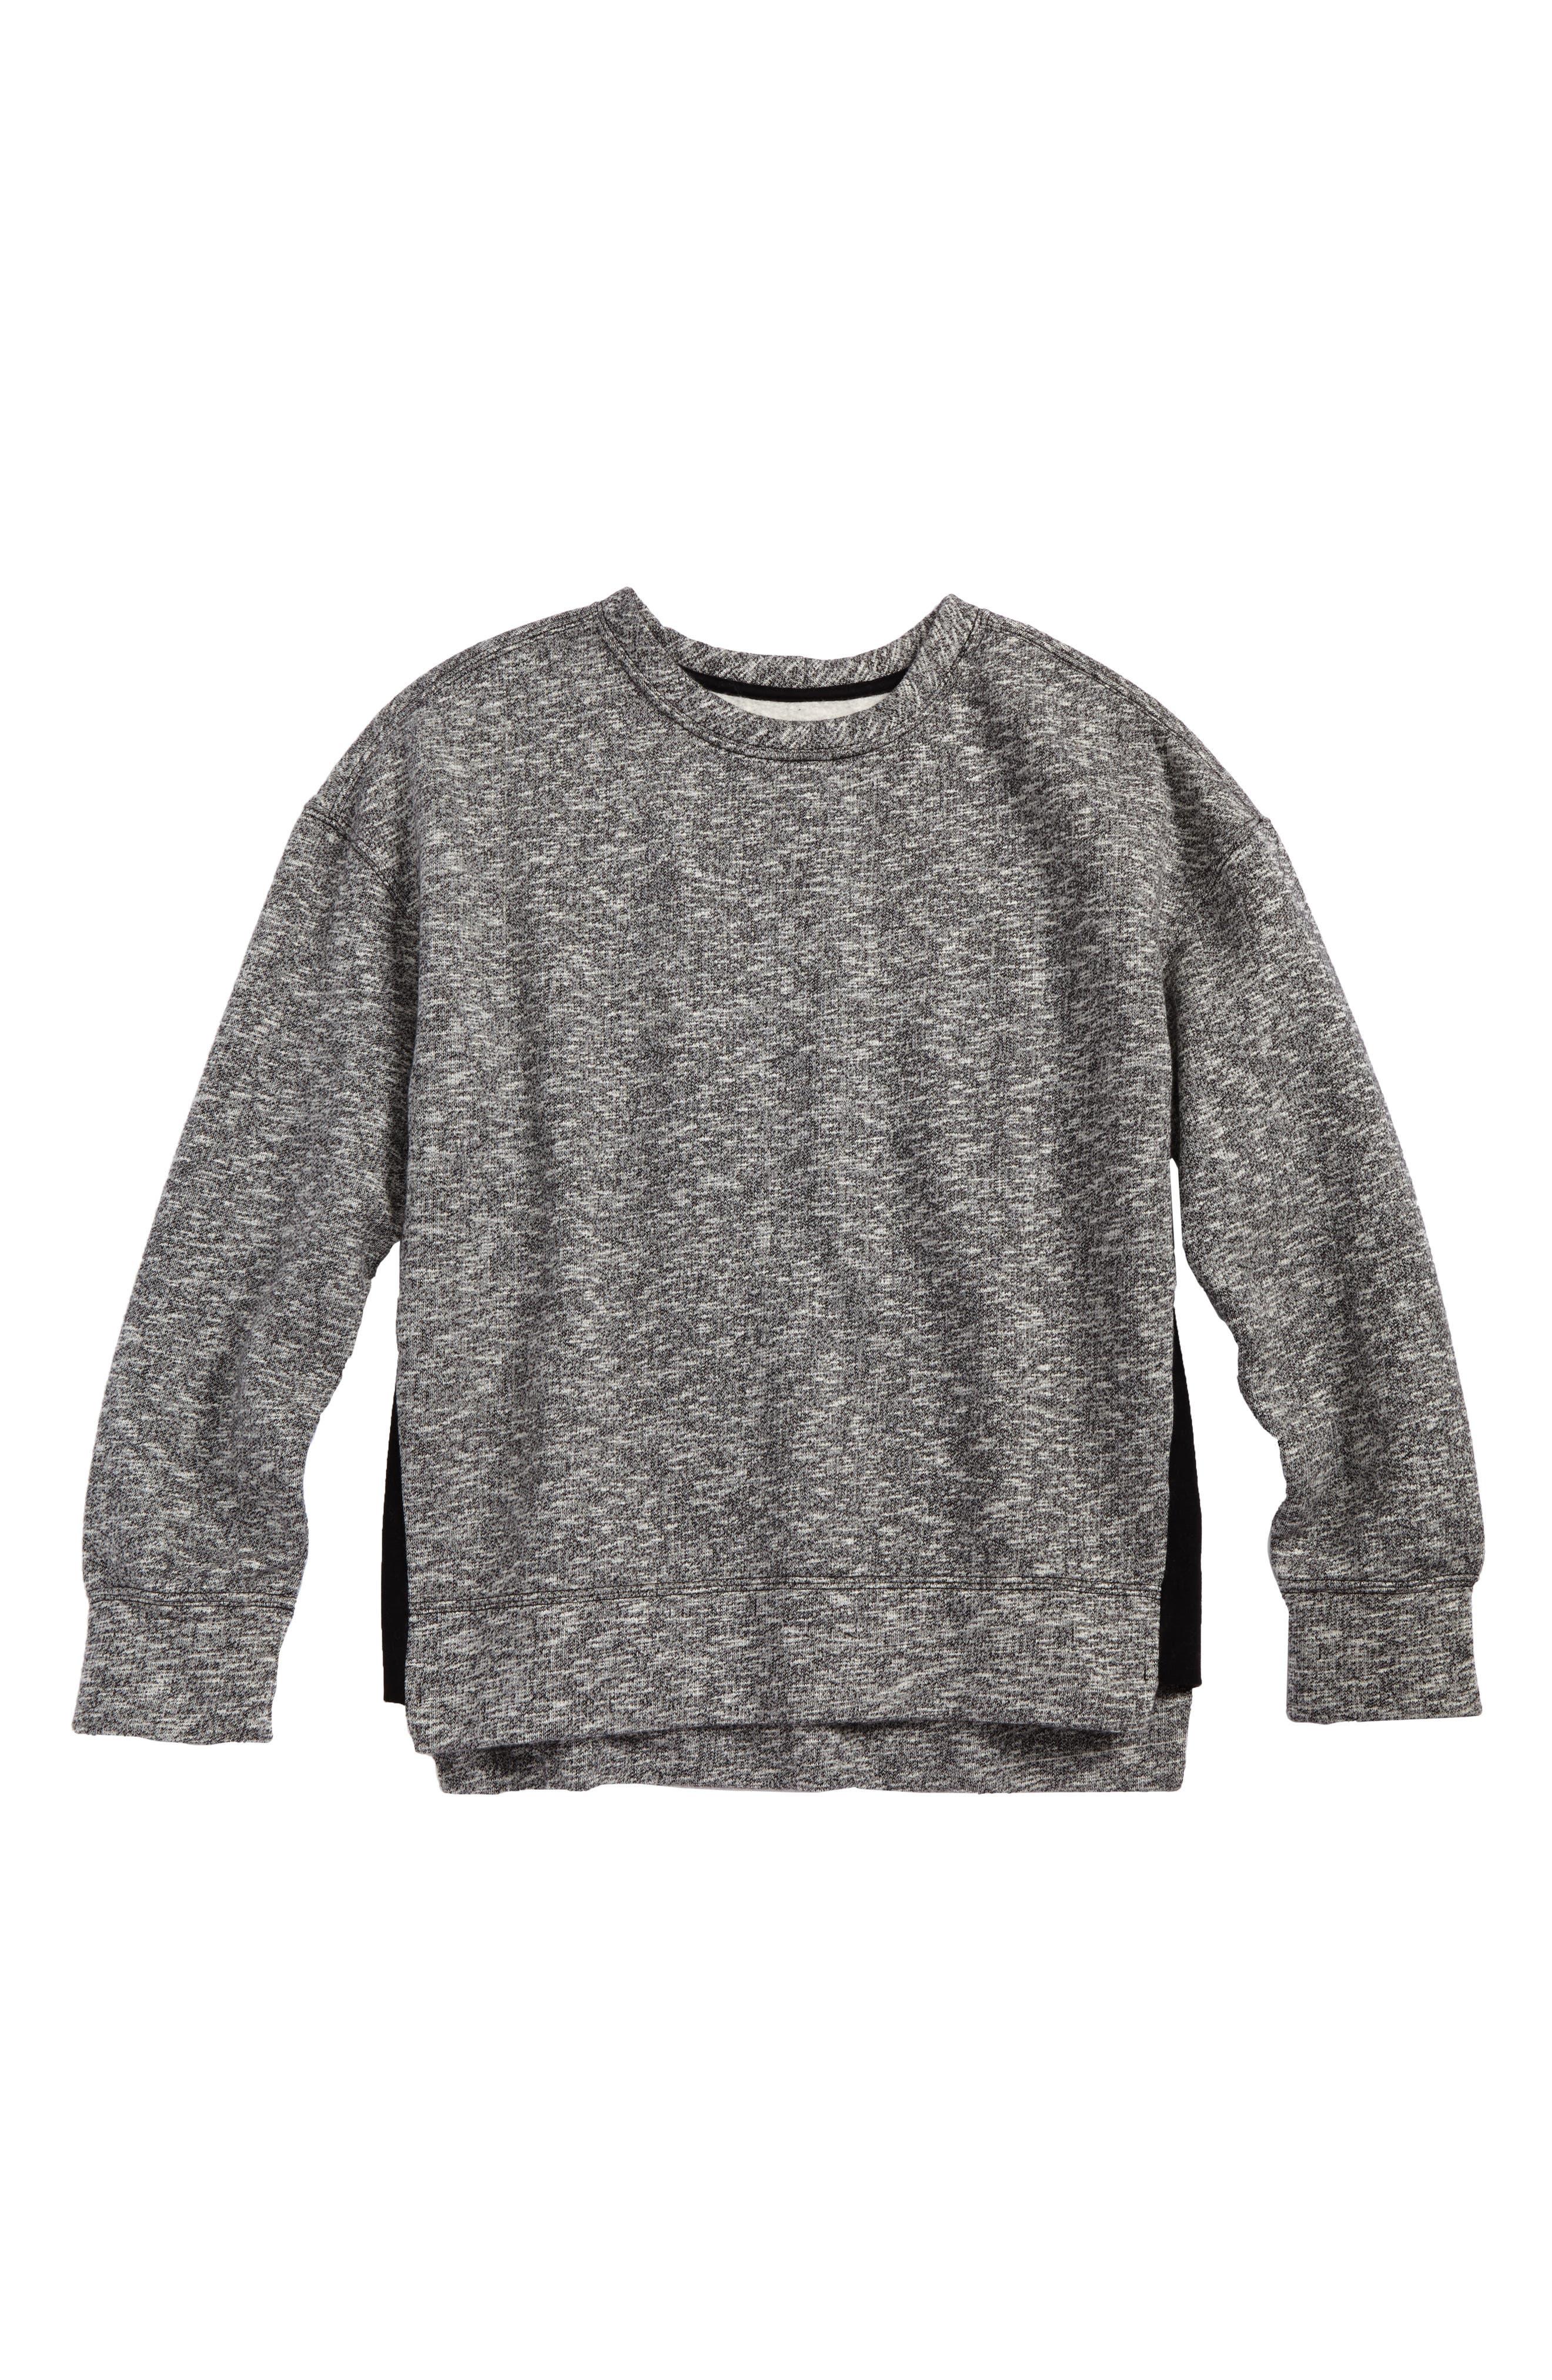 High/Low Sweatshirt,                         Main,                         color, Grey